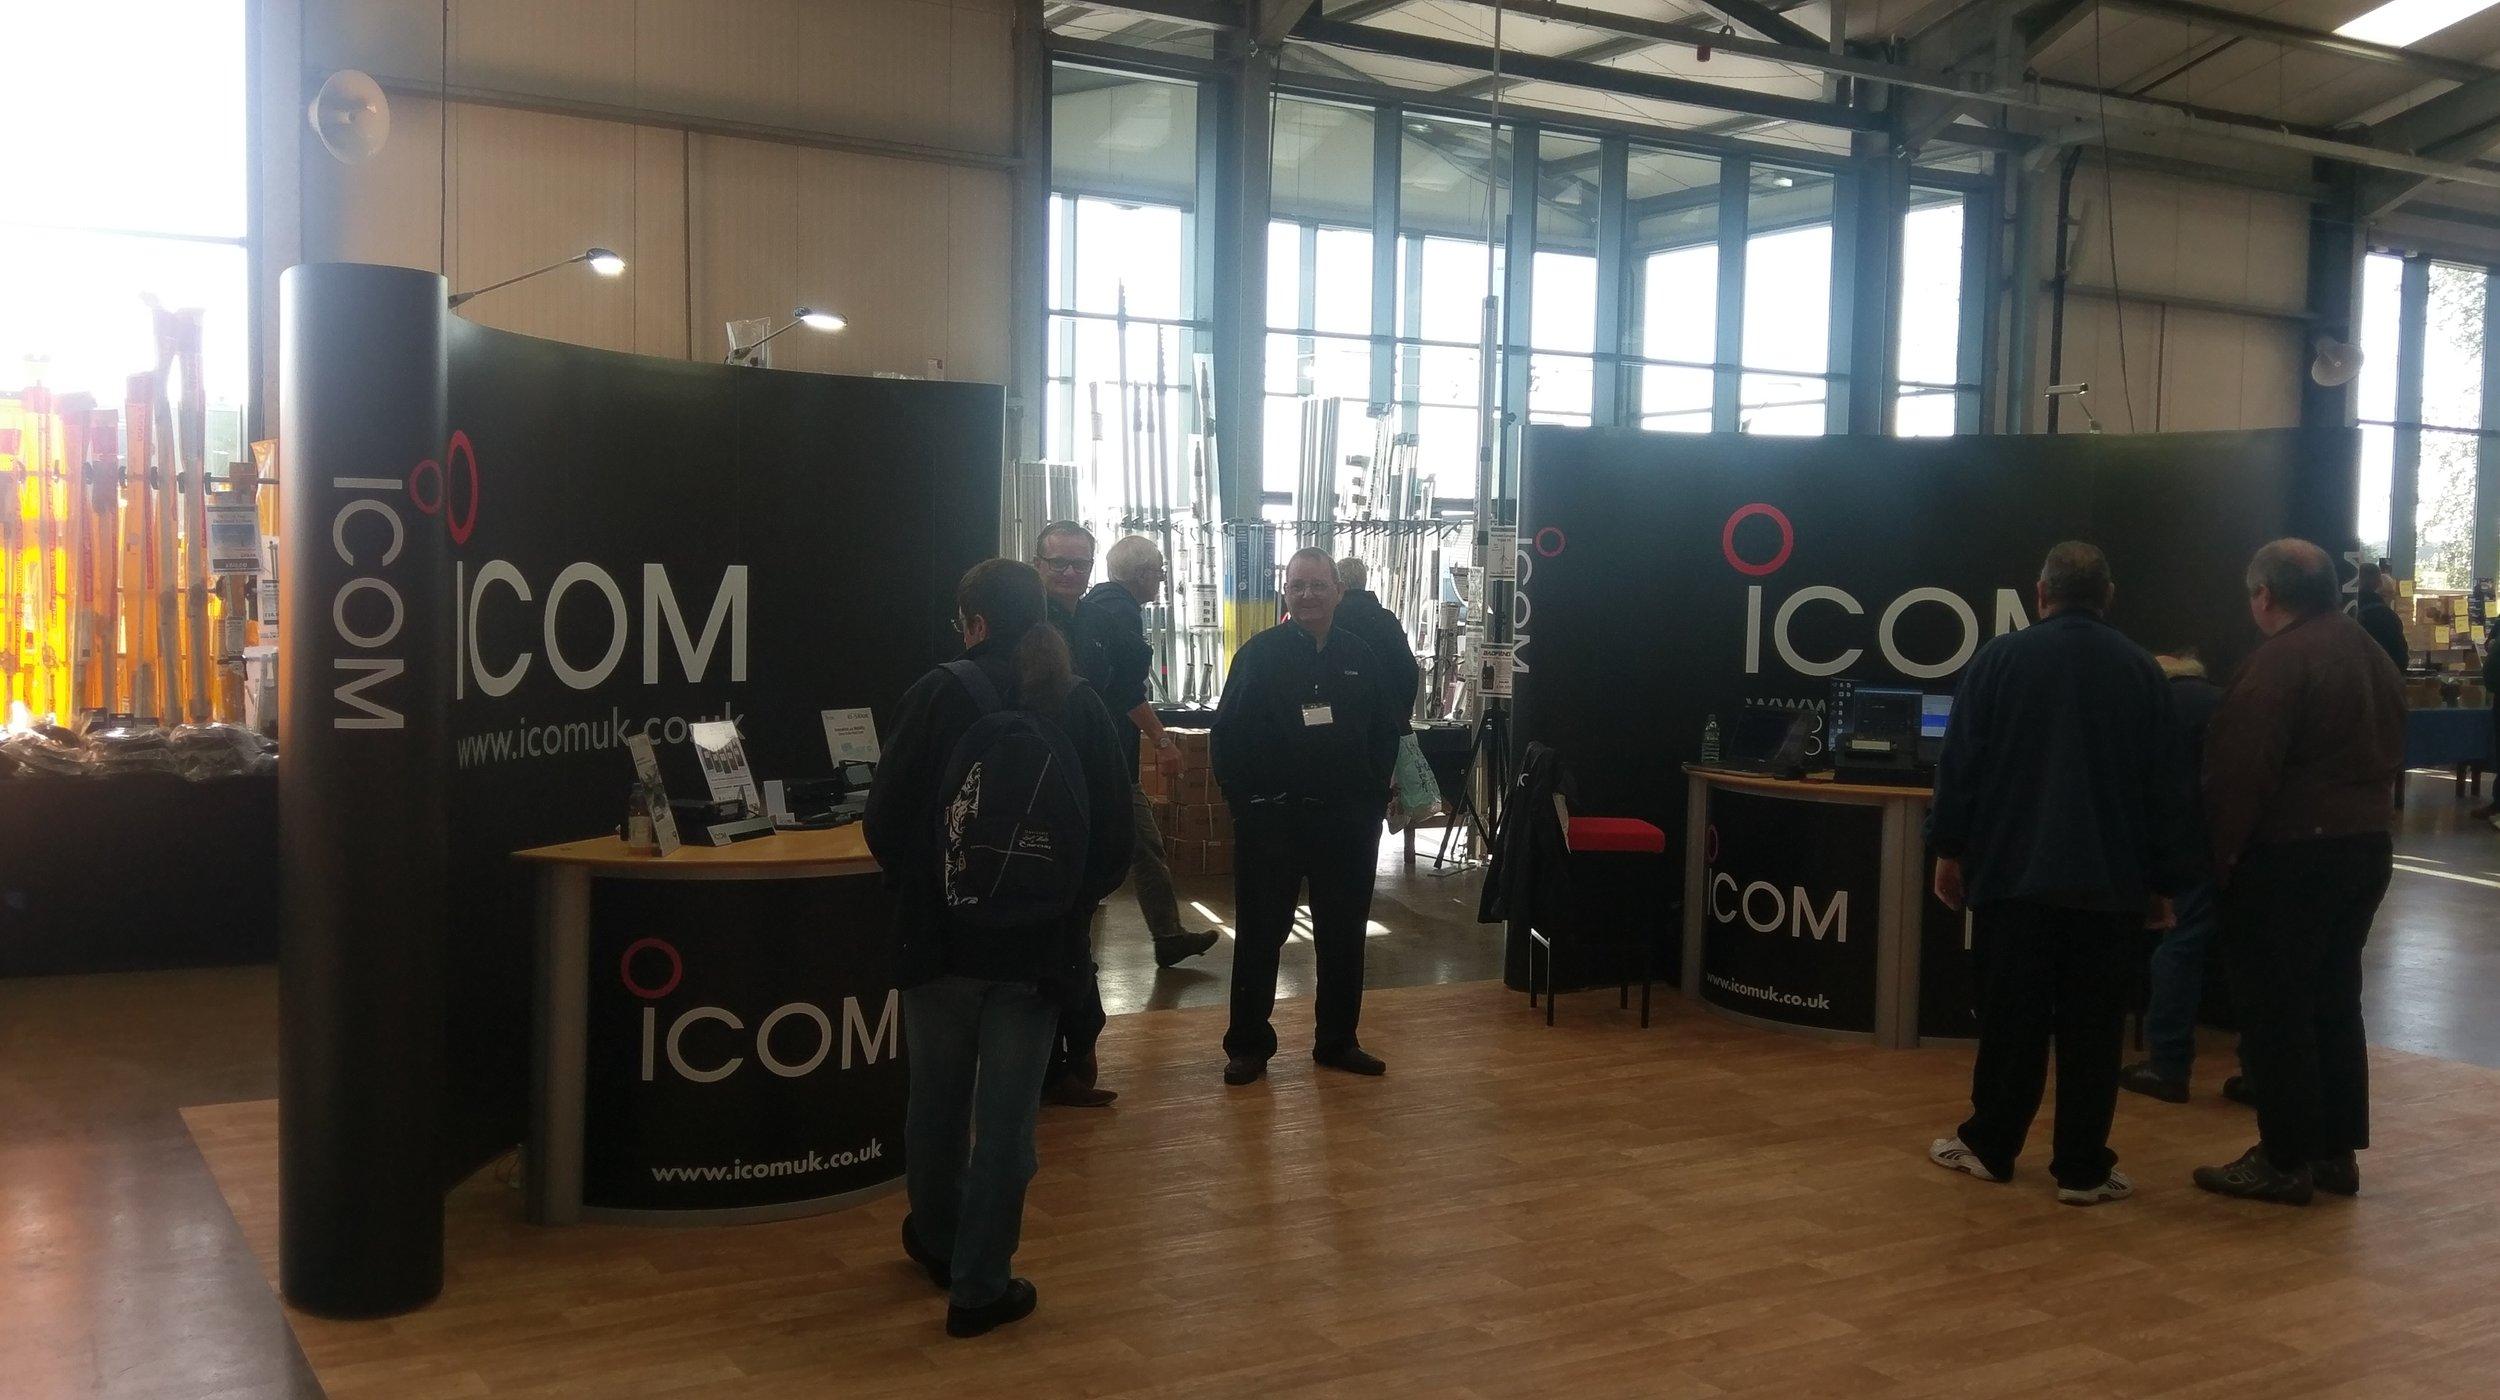 Icom are attending UK Hamfest